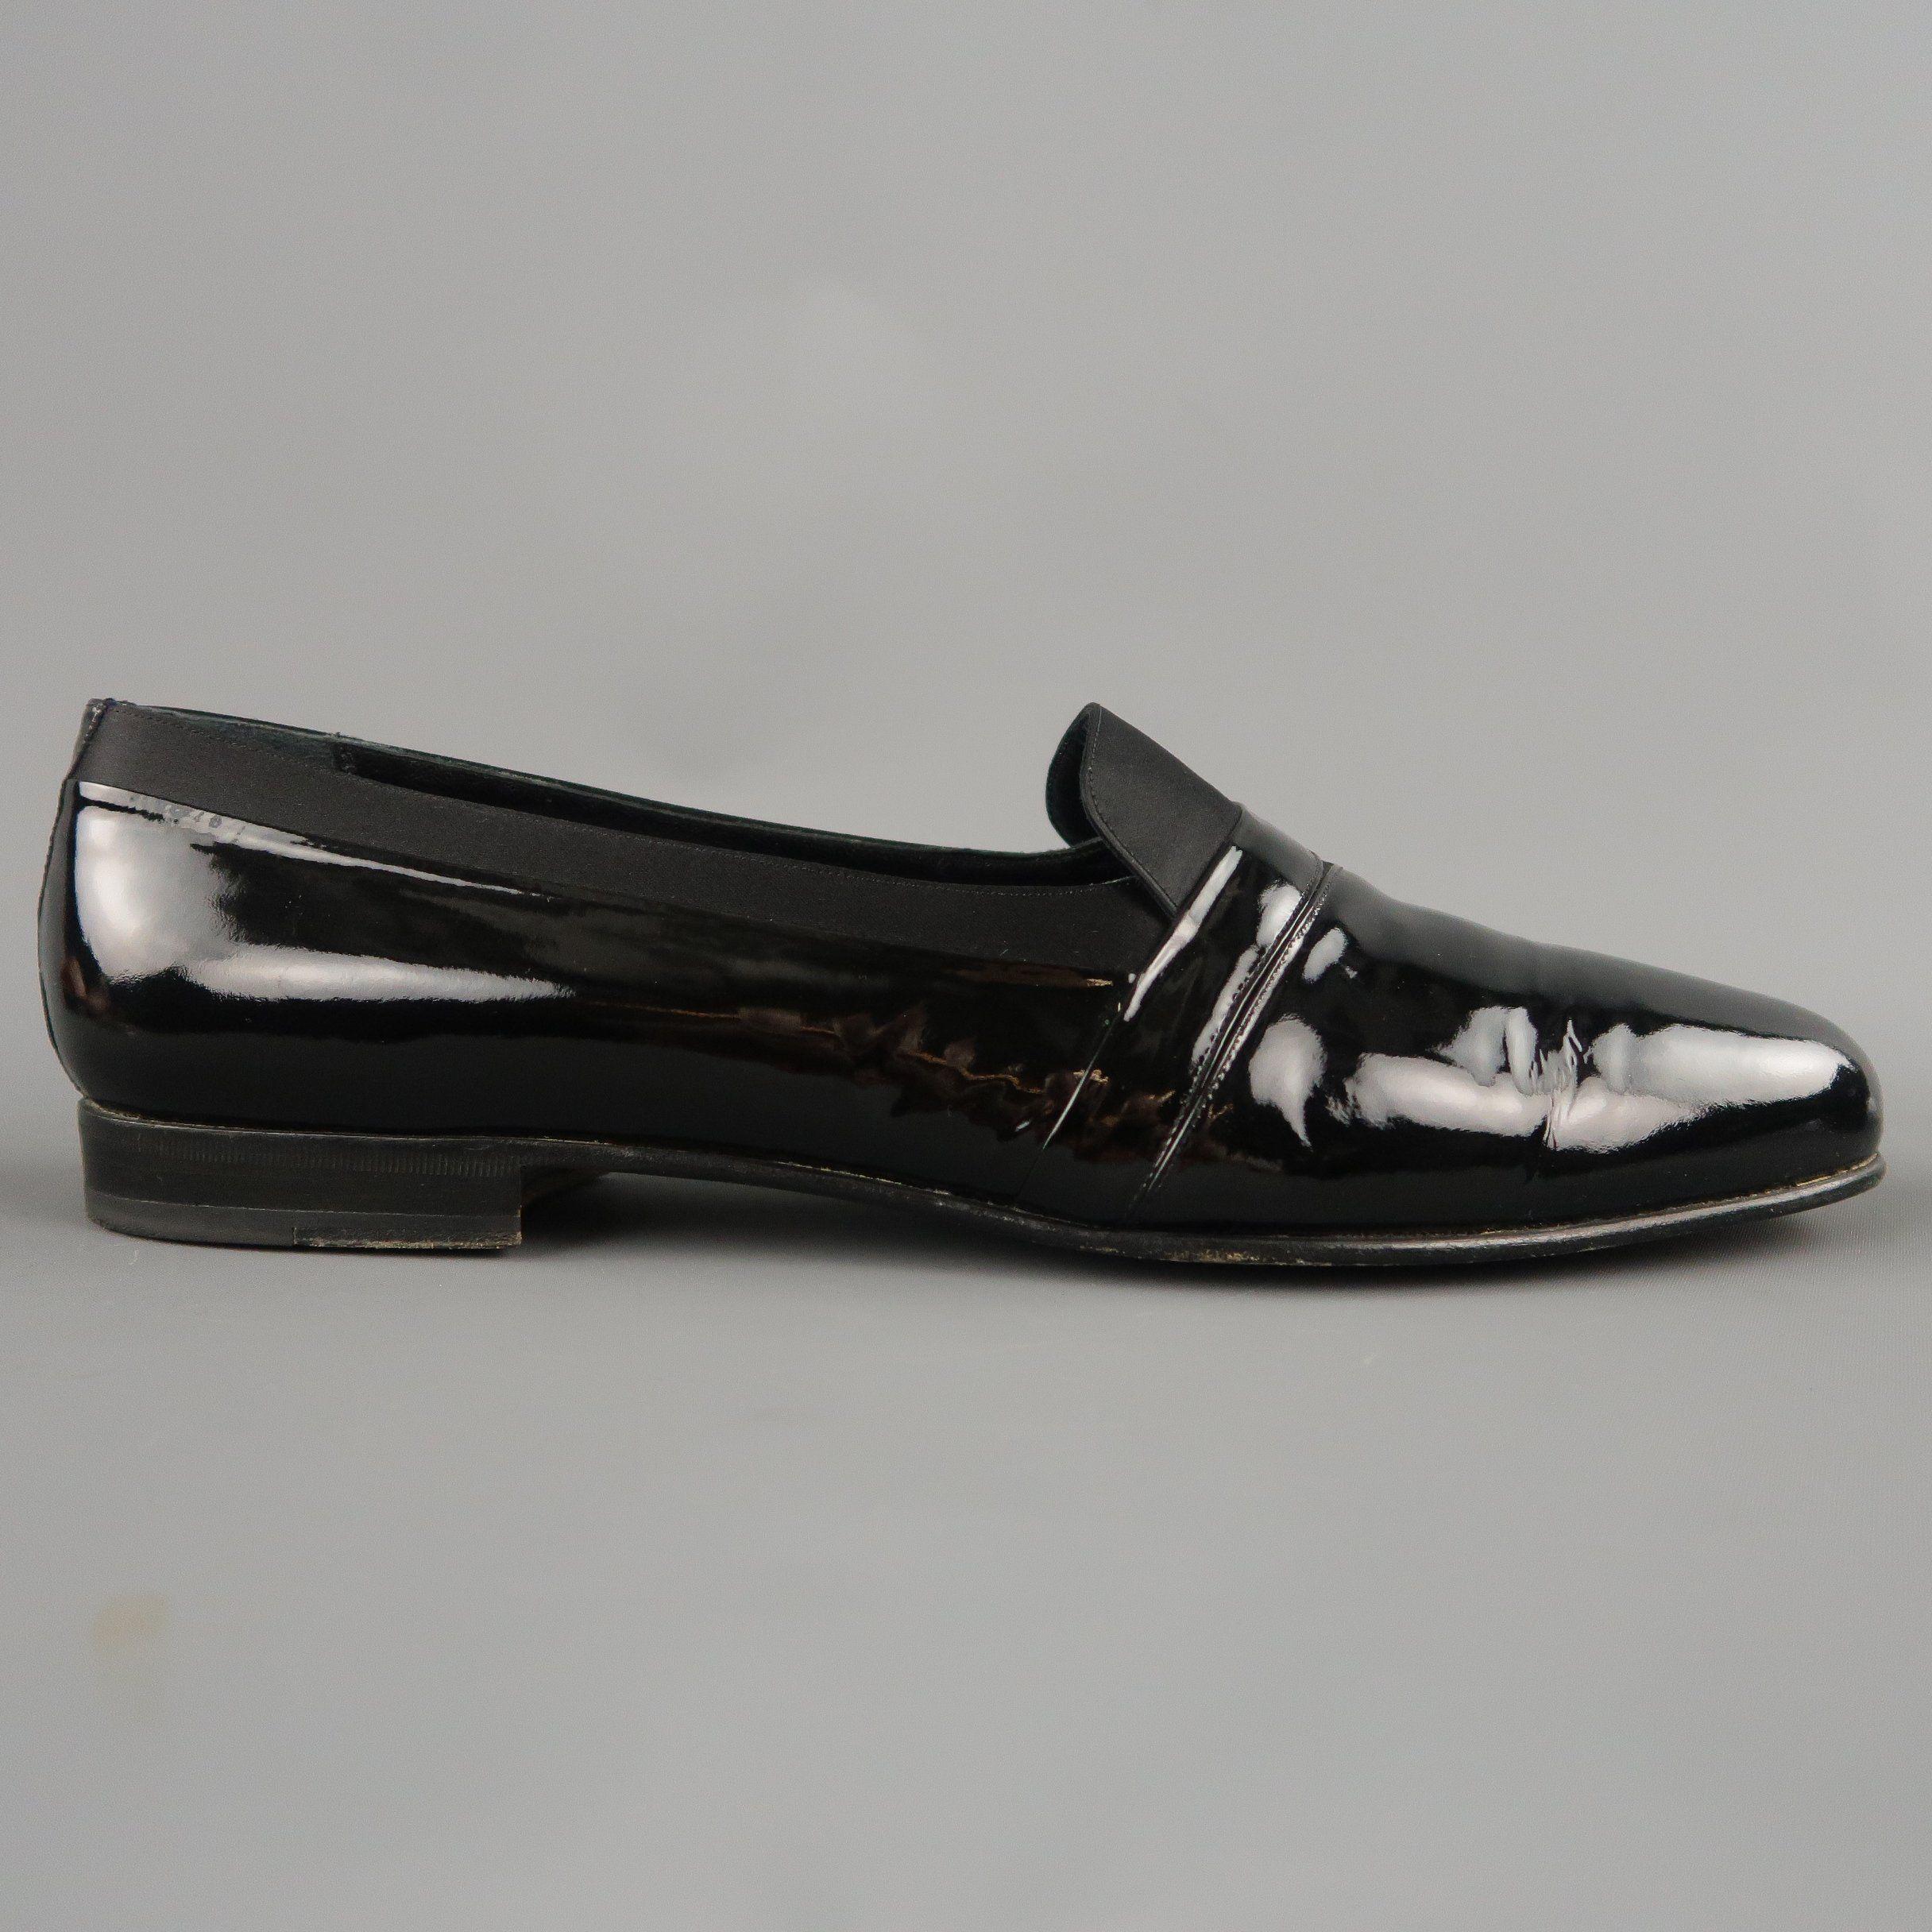 mezlan tuxedo shoes